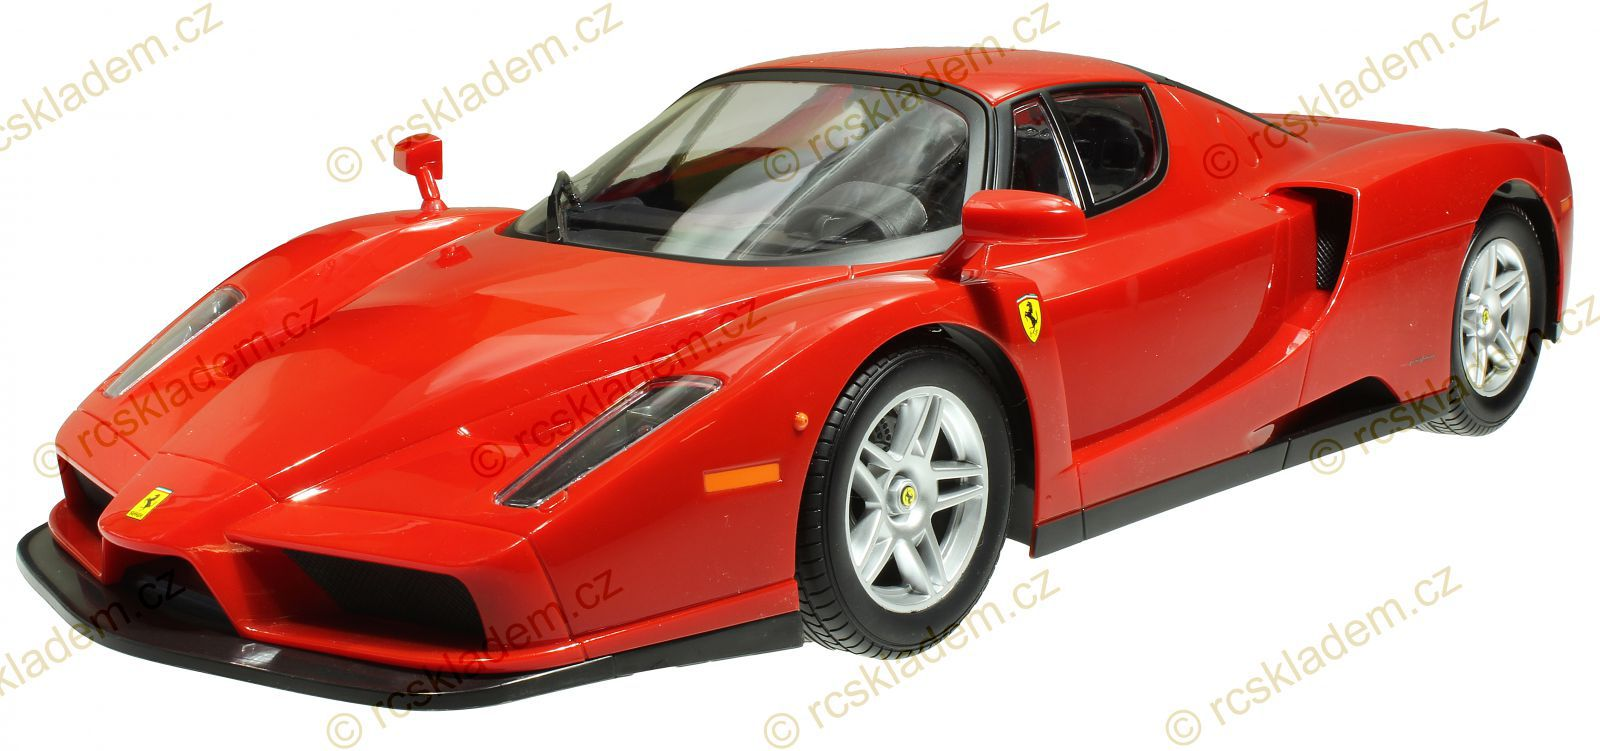 RC Enzo Ferrari 1:10